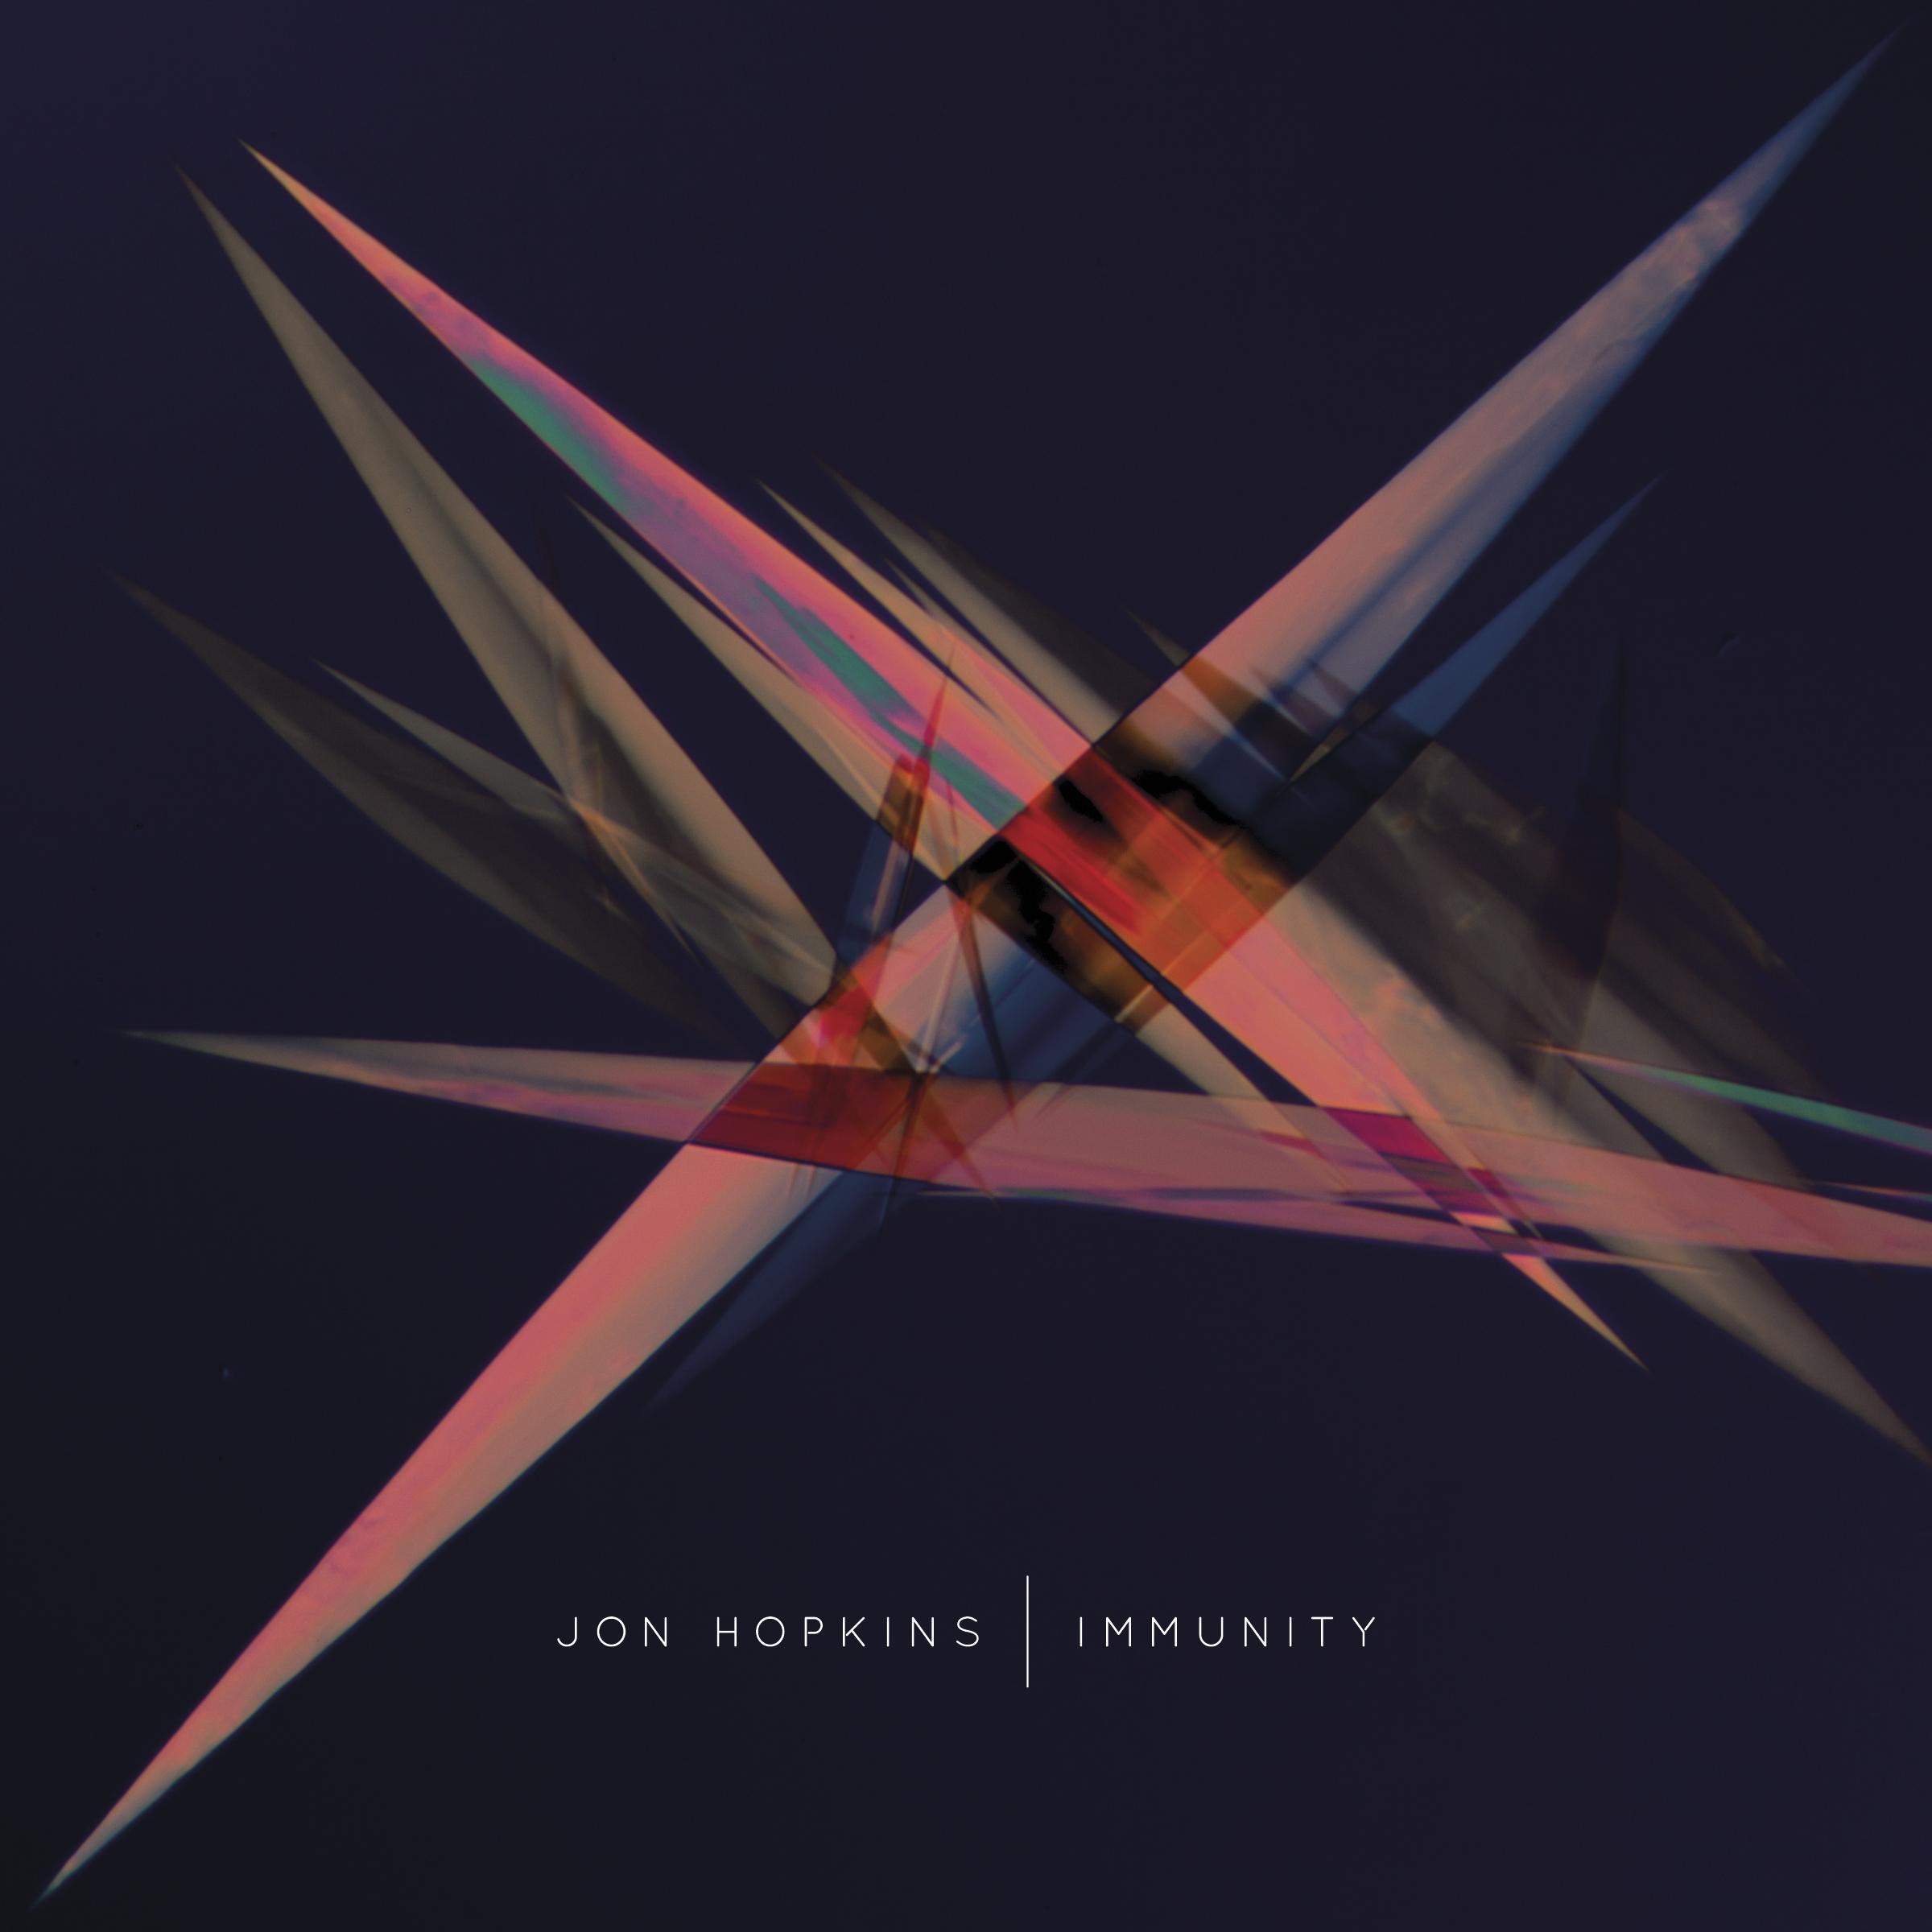 JonHopkins_AlbumArt